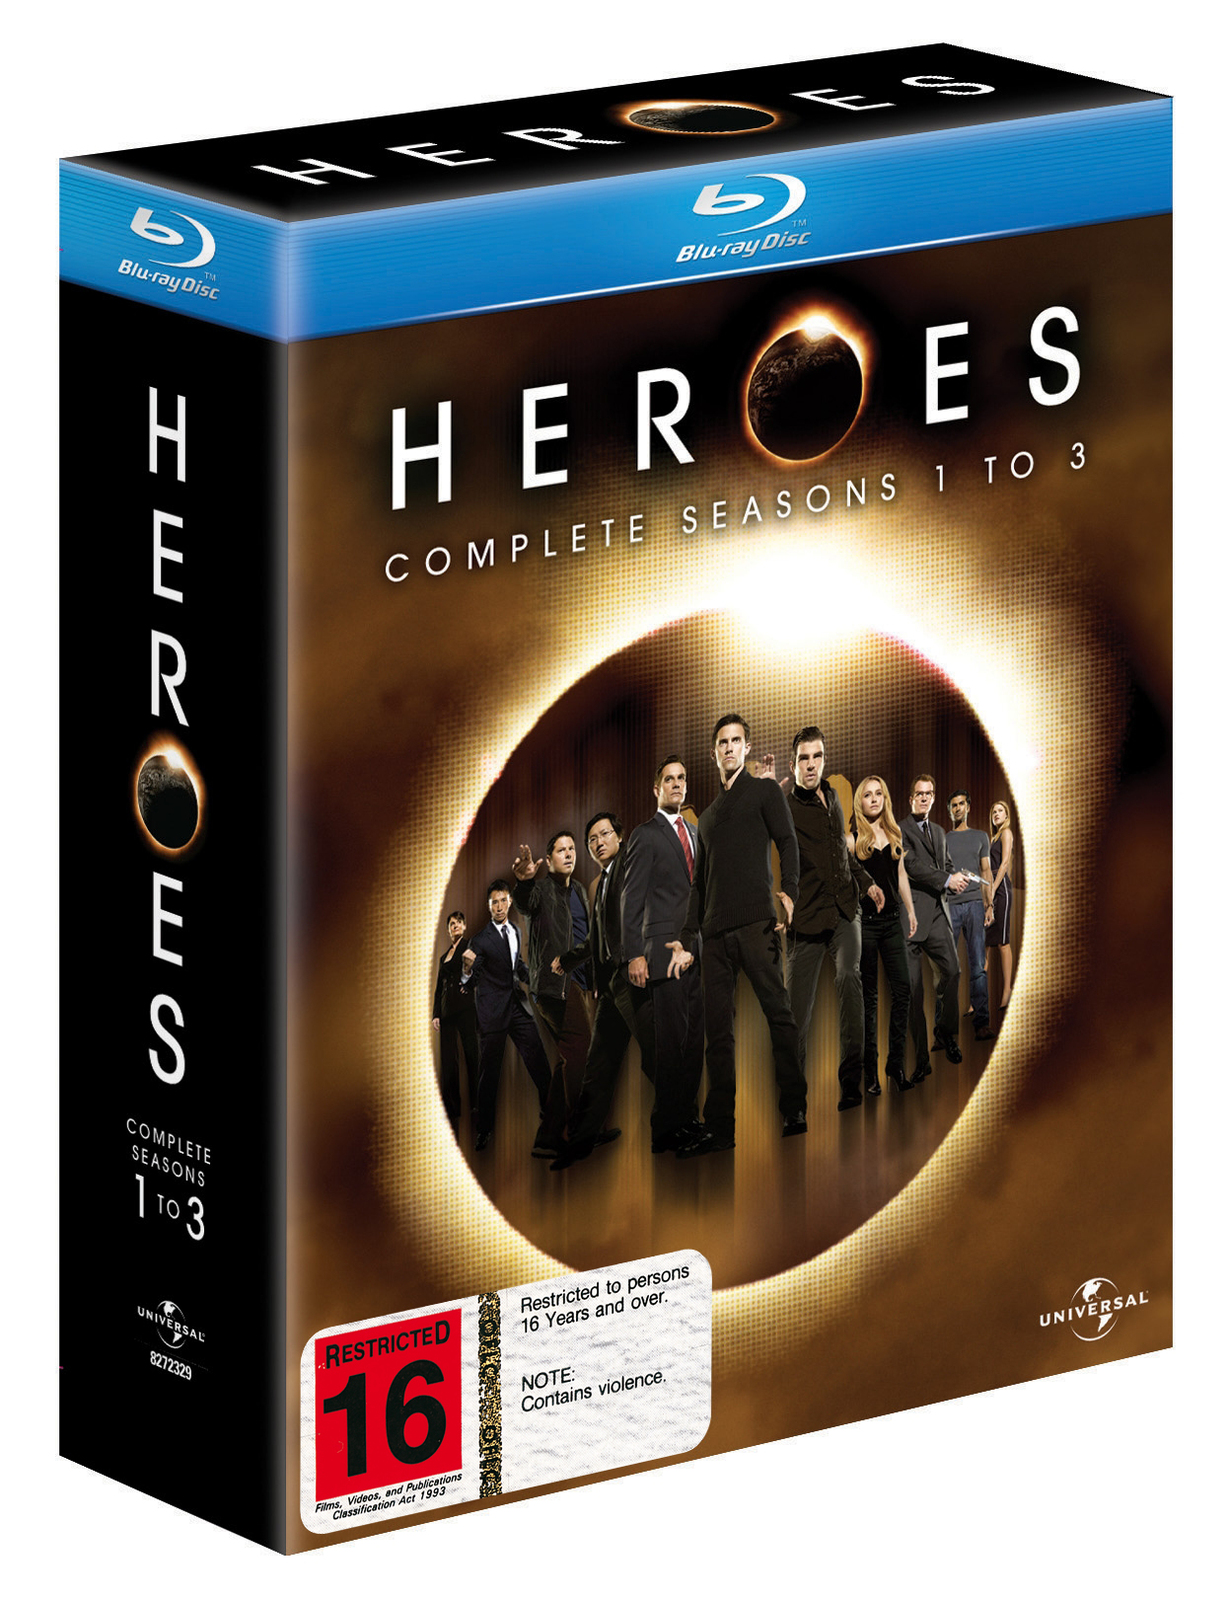 Heroes - Complete Seasons 1 to 3 (15 Disc Set) on Blu-ray image